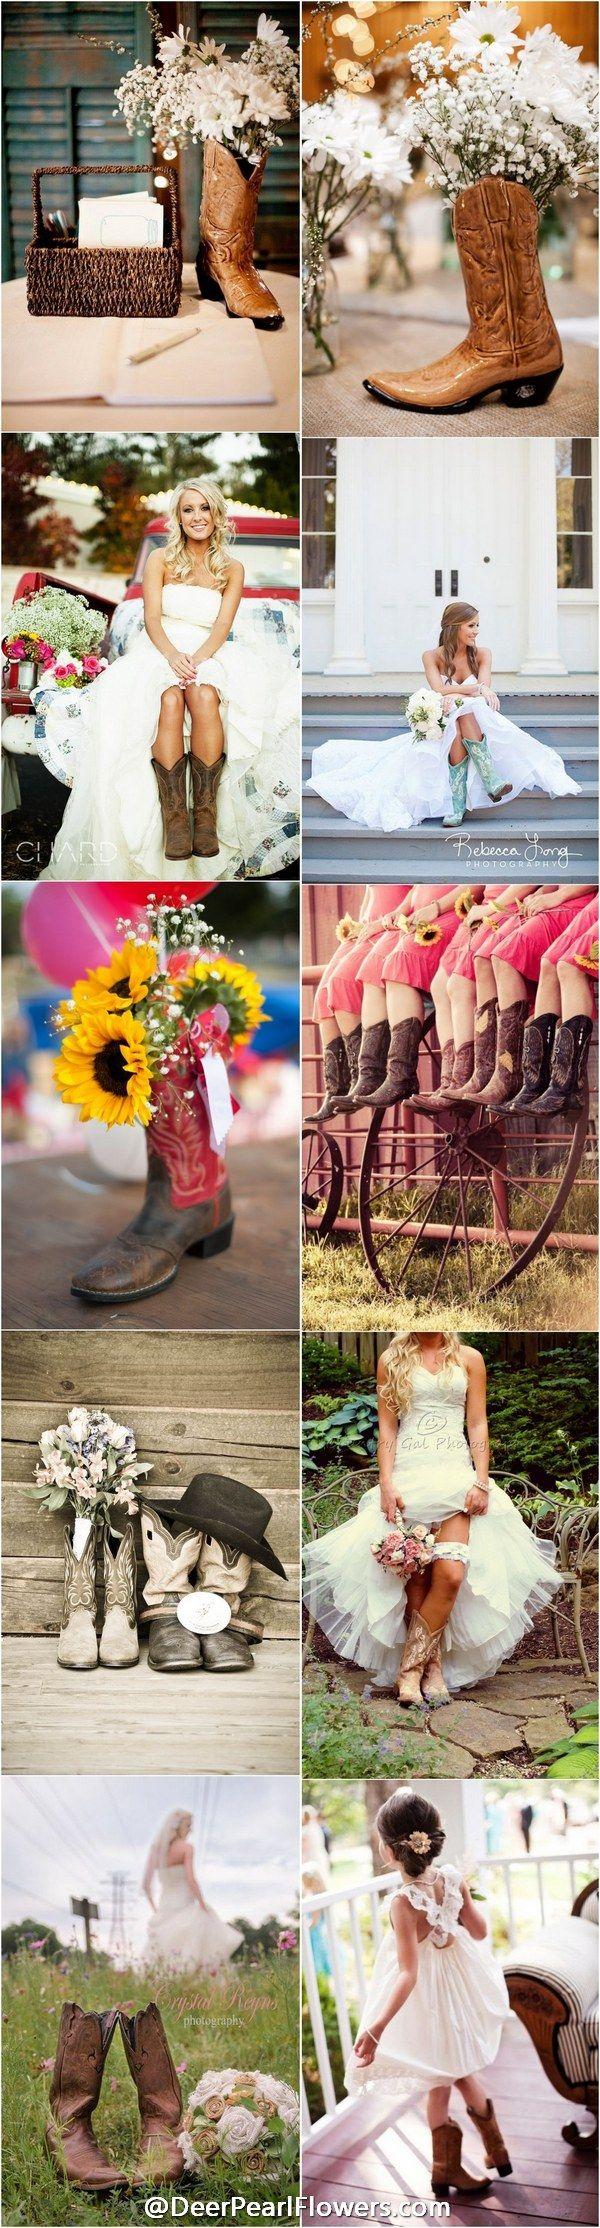 rustic country cowboy cowgirl wedding ideas / http://www.deerpearlflowers.com/cowgirl-boots-fall-wedding-ideas/